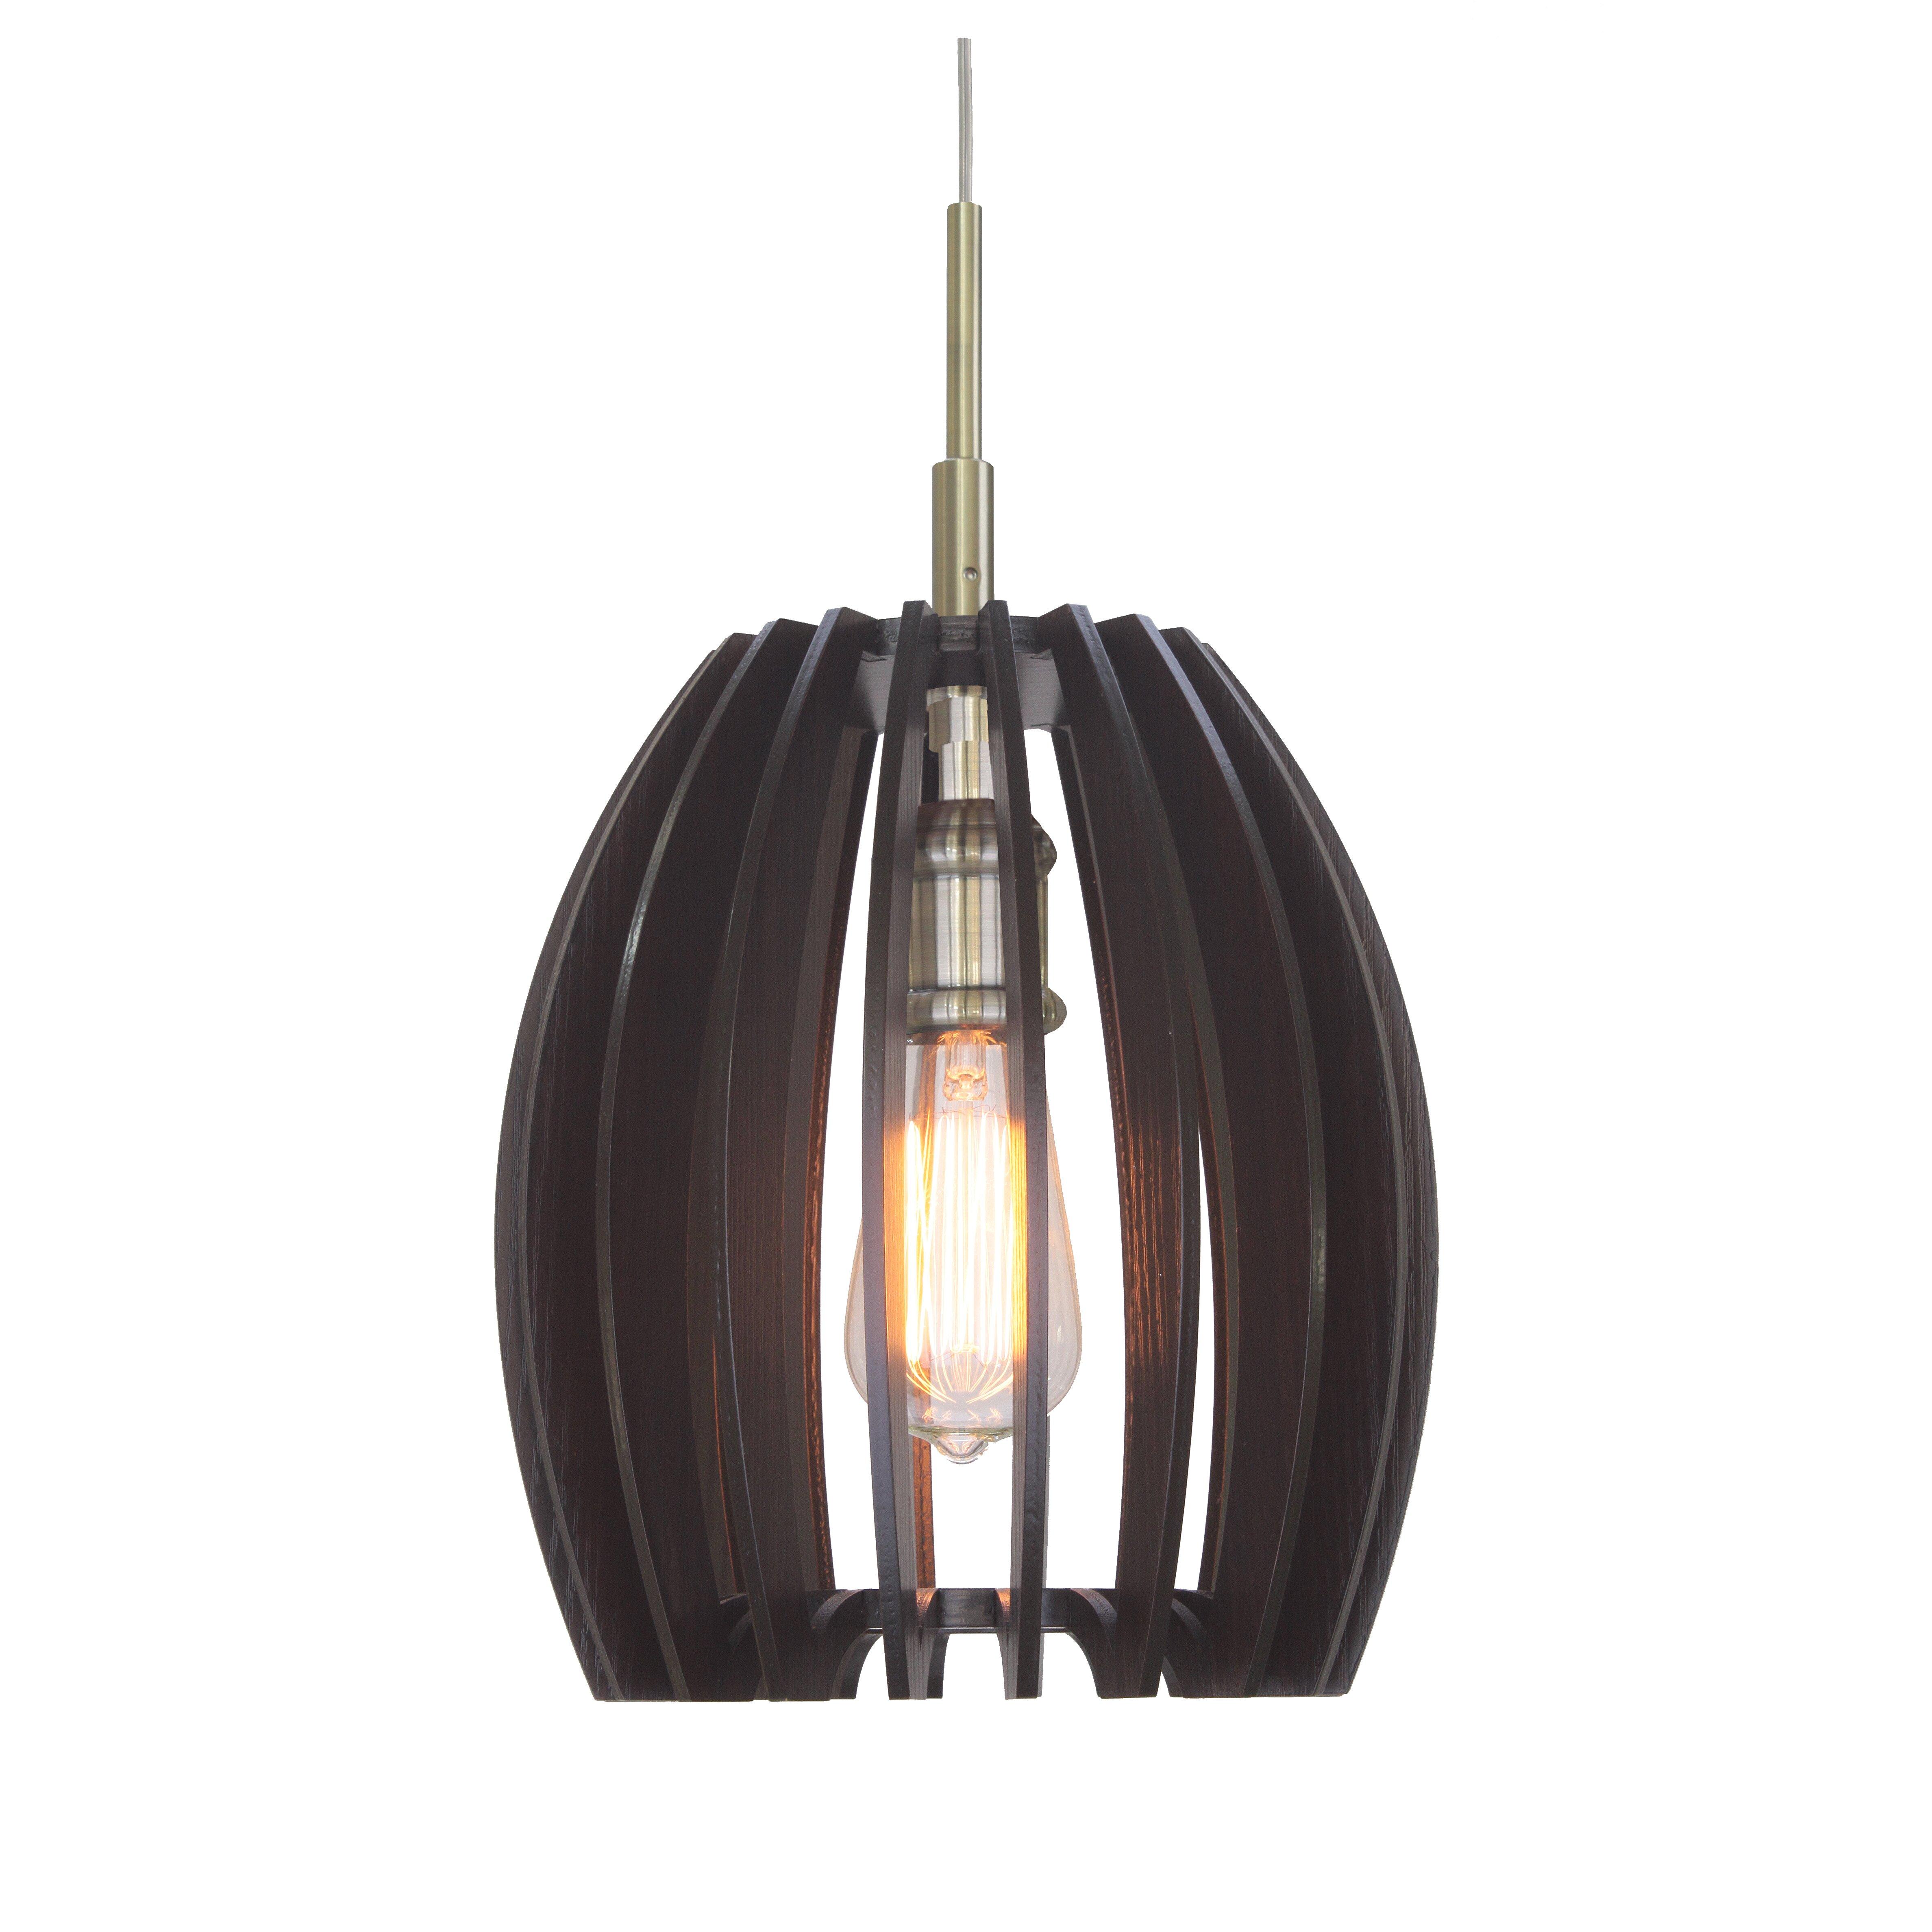 Woodbridge Lighting Canopy 1 Light Mini PendantCanopy 1 Light Mini Pendant   Reviews   AllModern. All Modern Pendant Lighting. Home Design Ideas